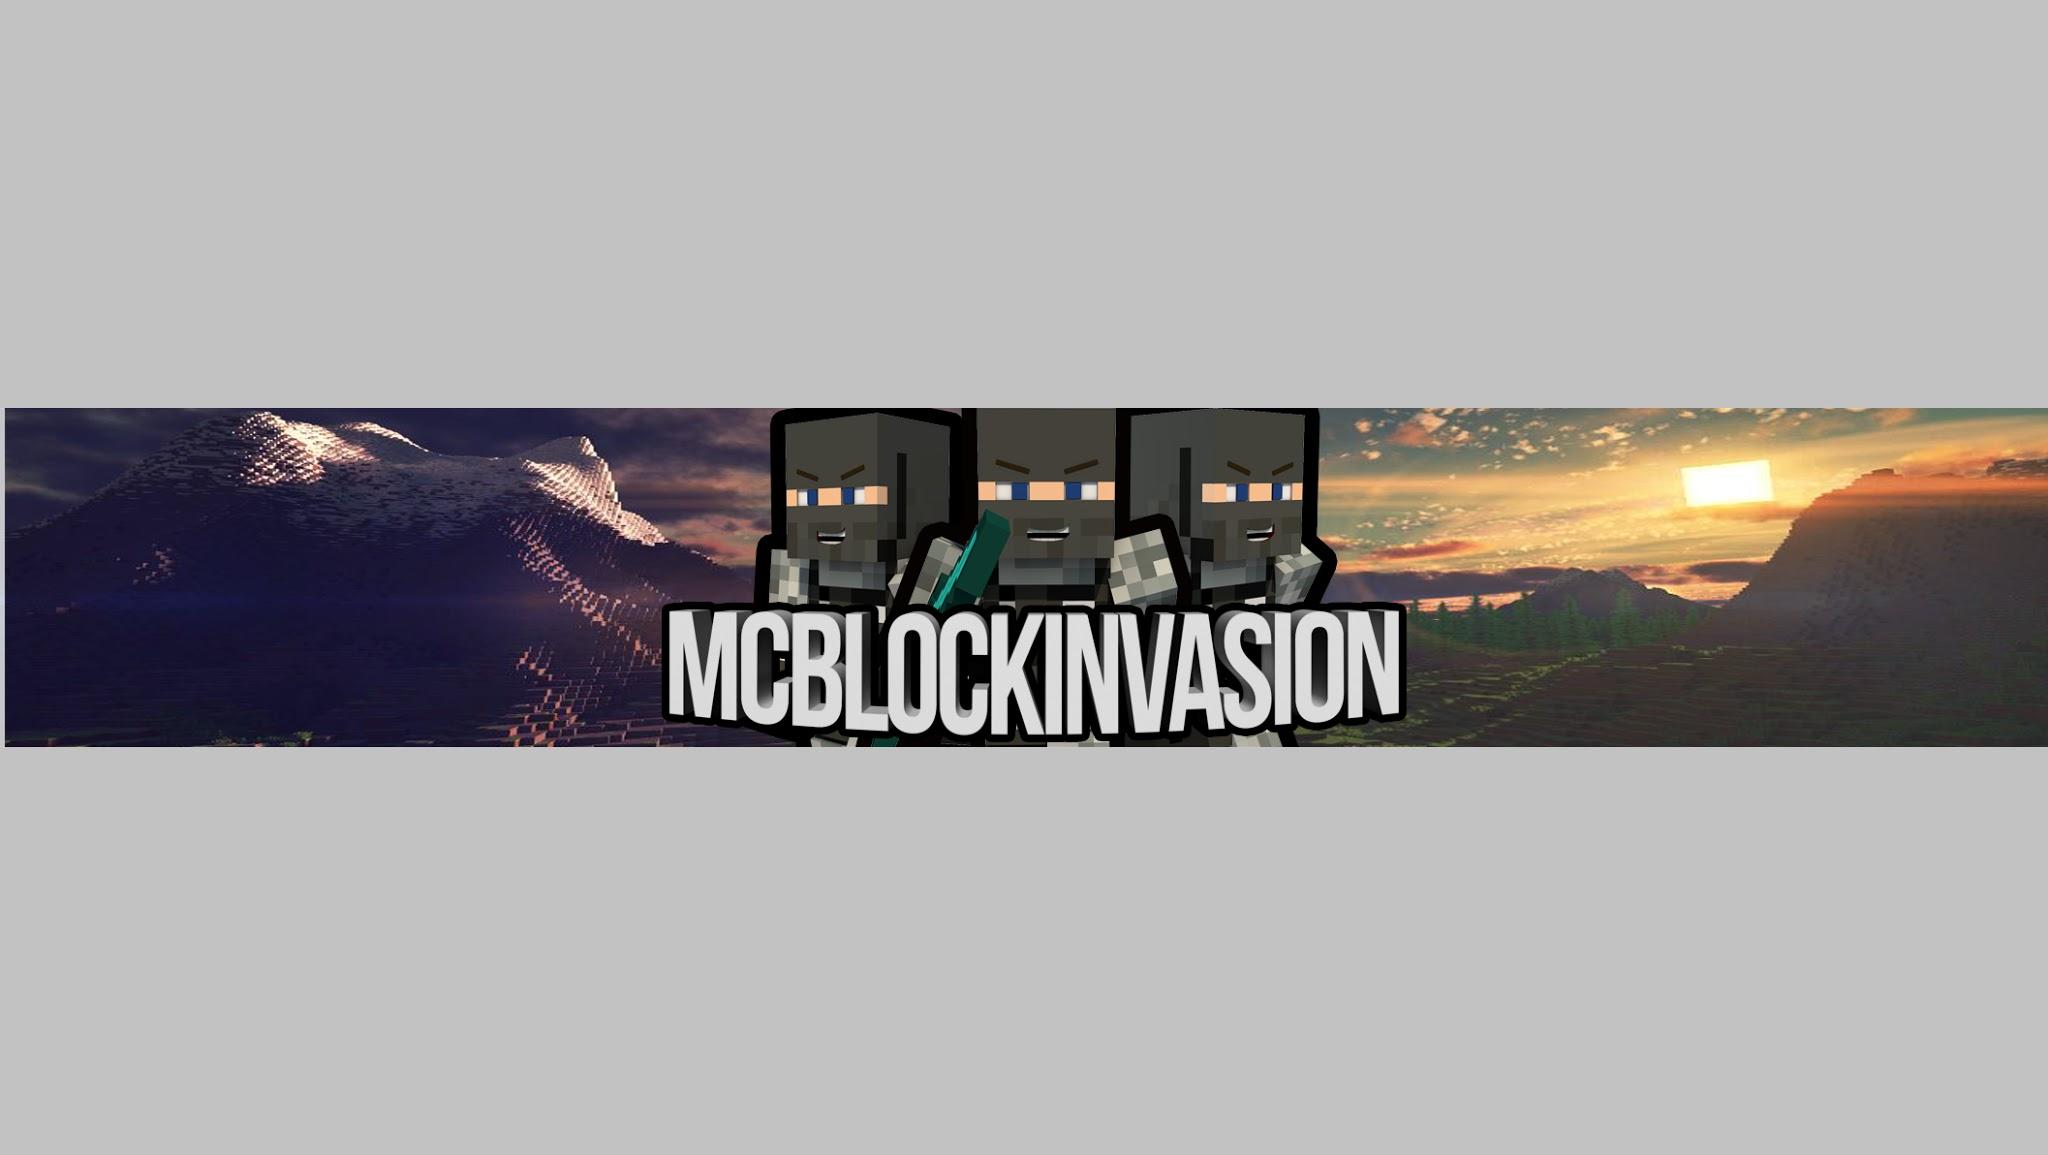 MCblockinvasion - YouTube